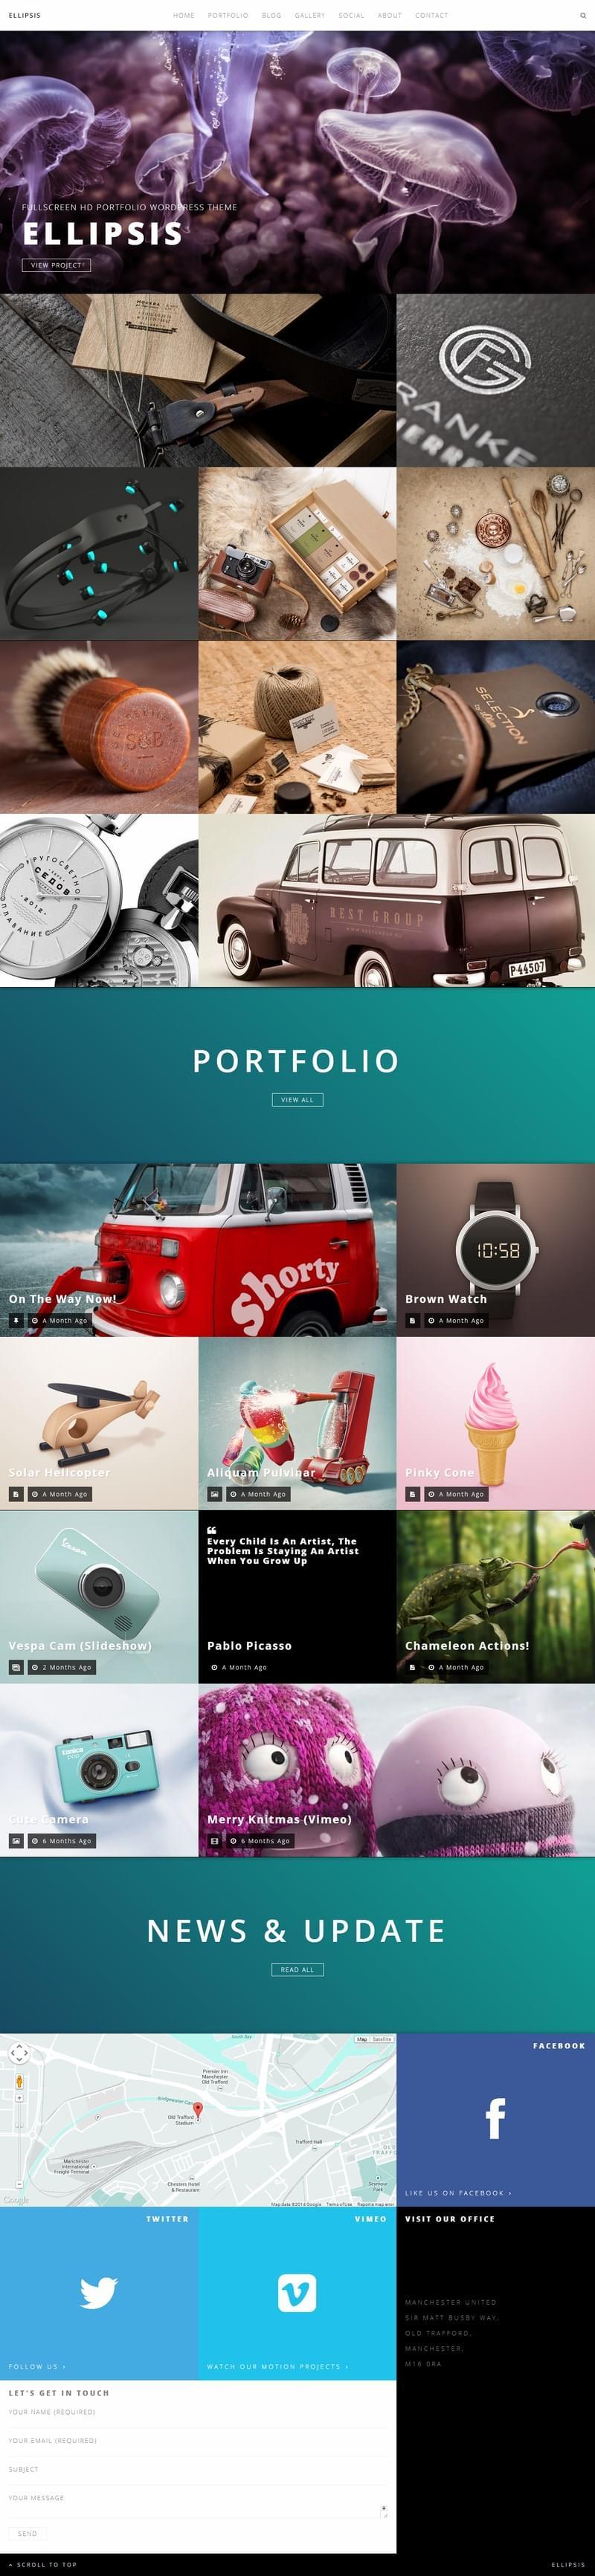 Ellipsis – Fullscreen HD Portfolio WordPress Theme